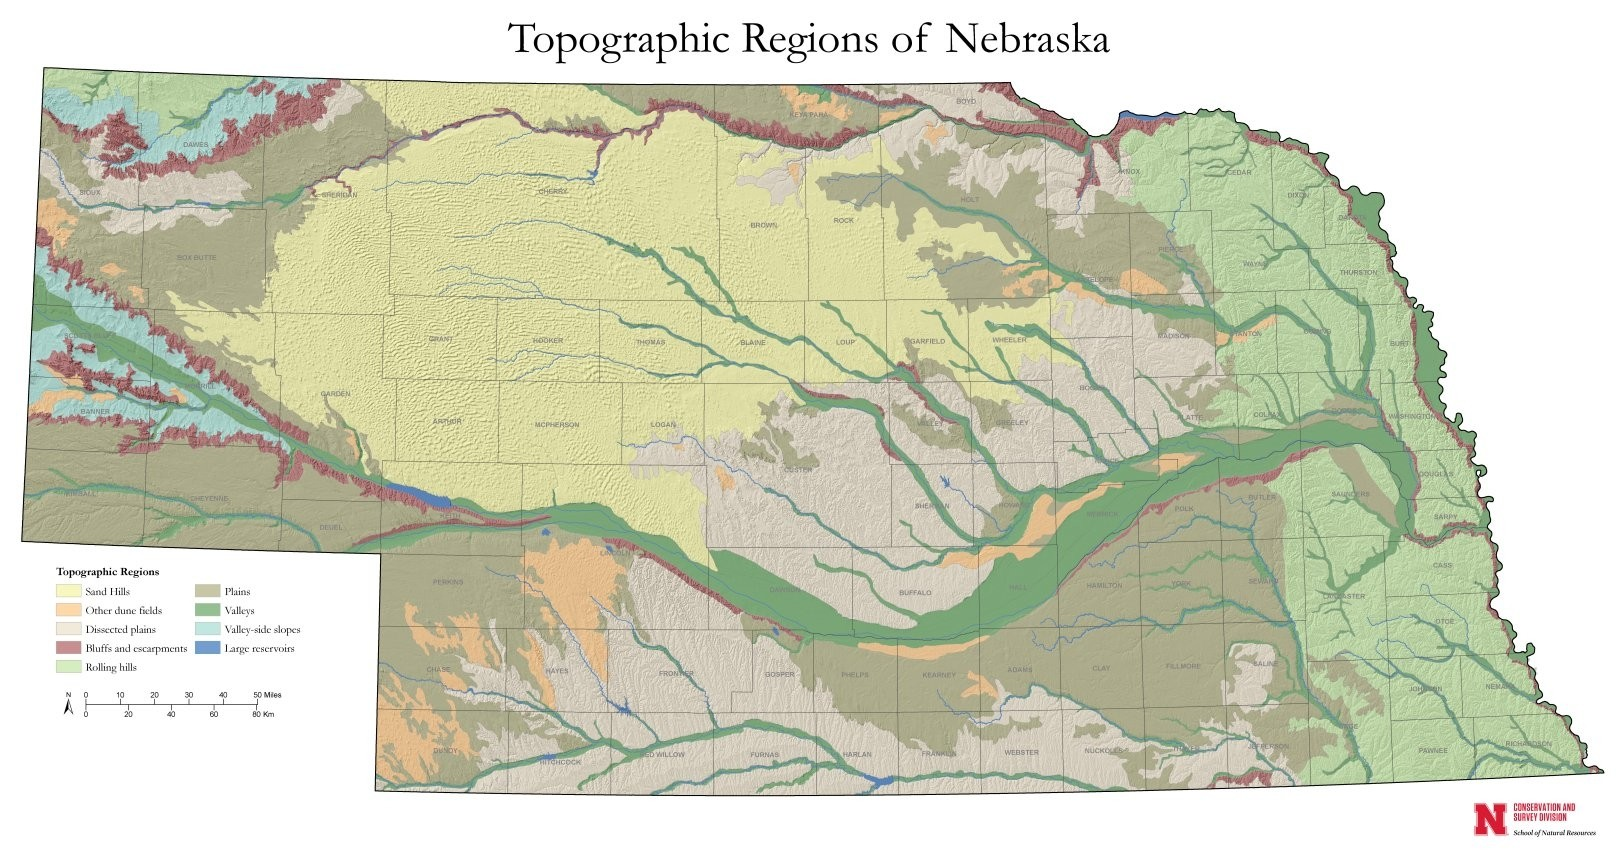 Topographic Regions of Nebraska (GIM-232)